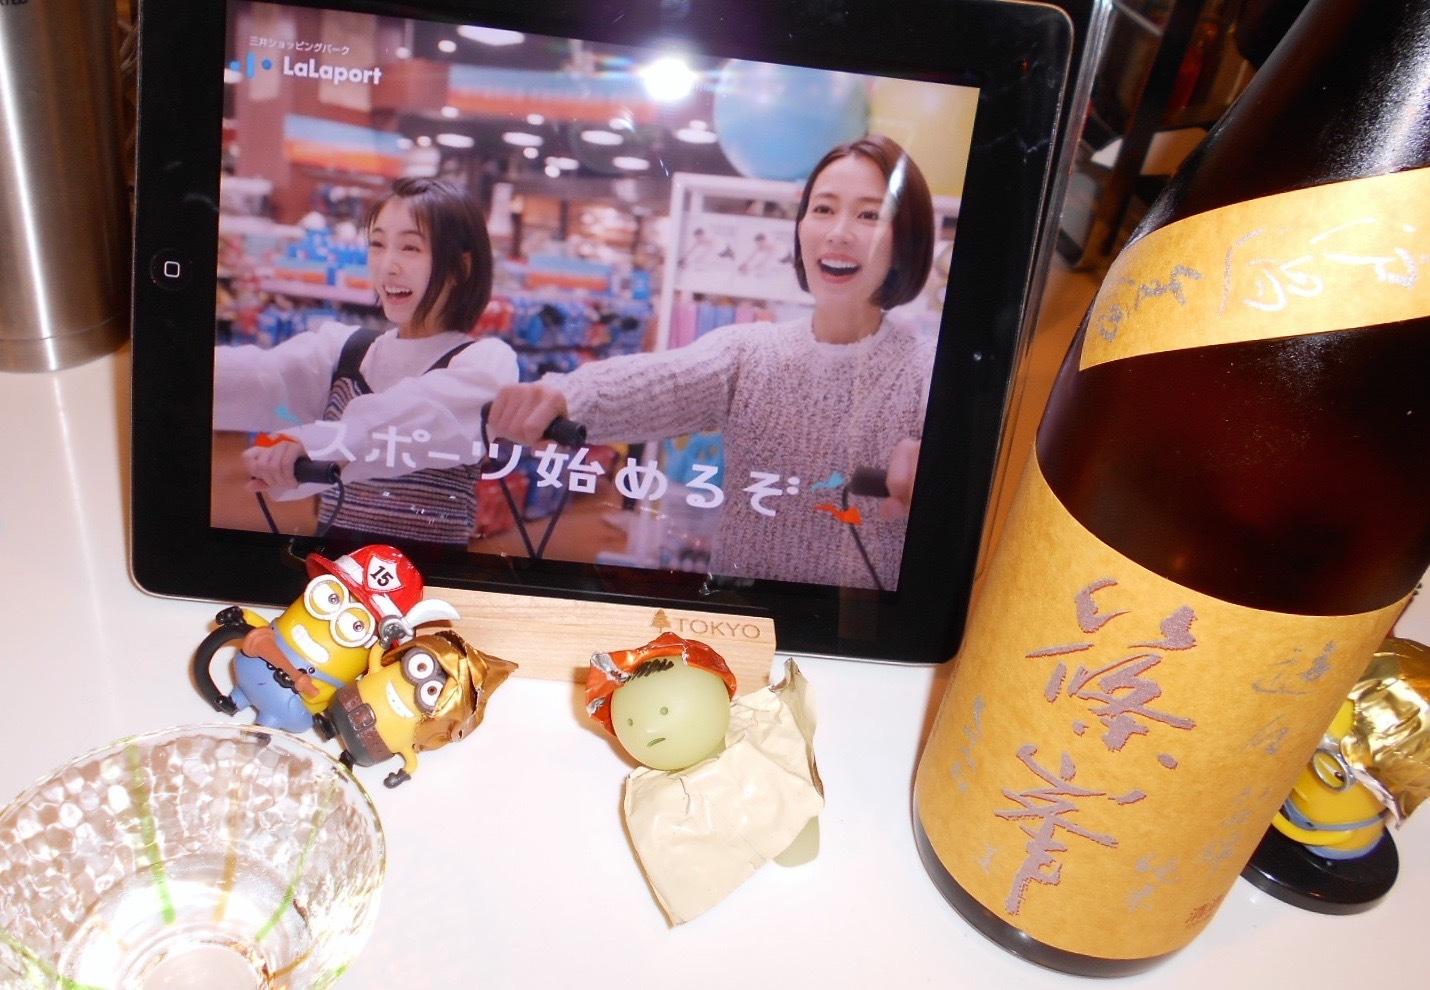 shihnomine_yuyu30by7.jpg